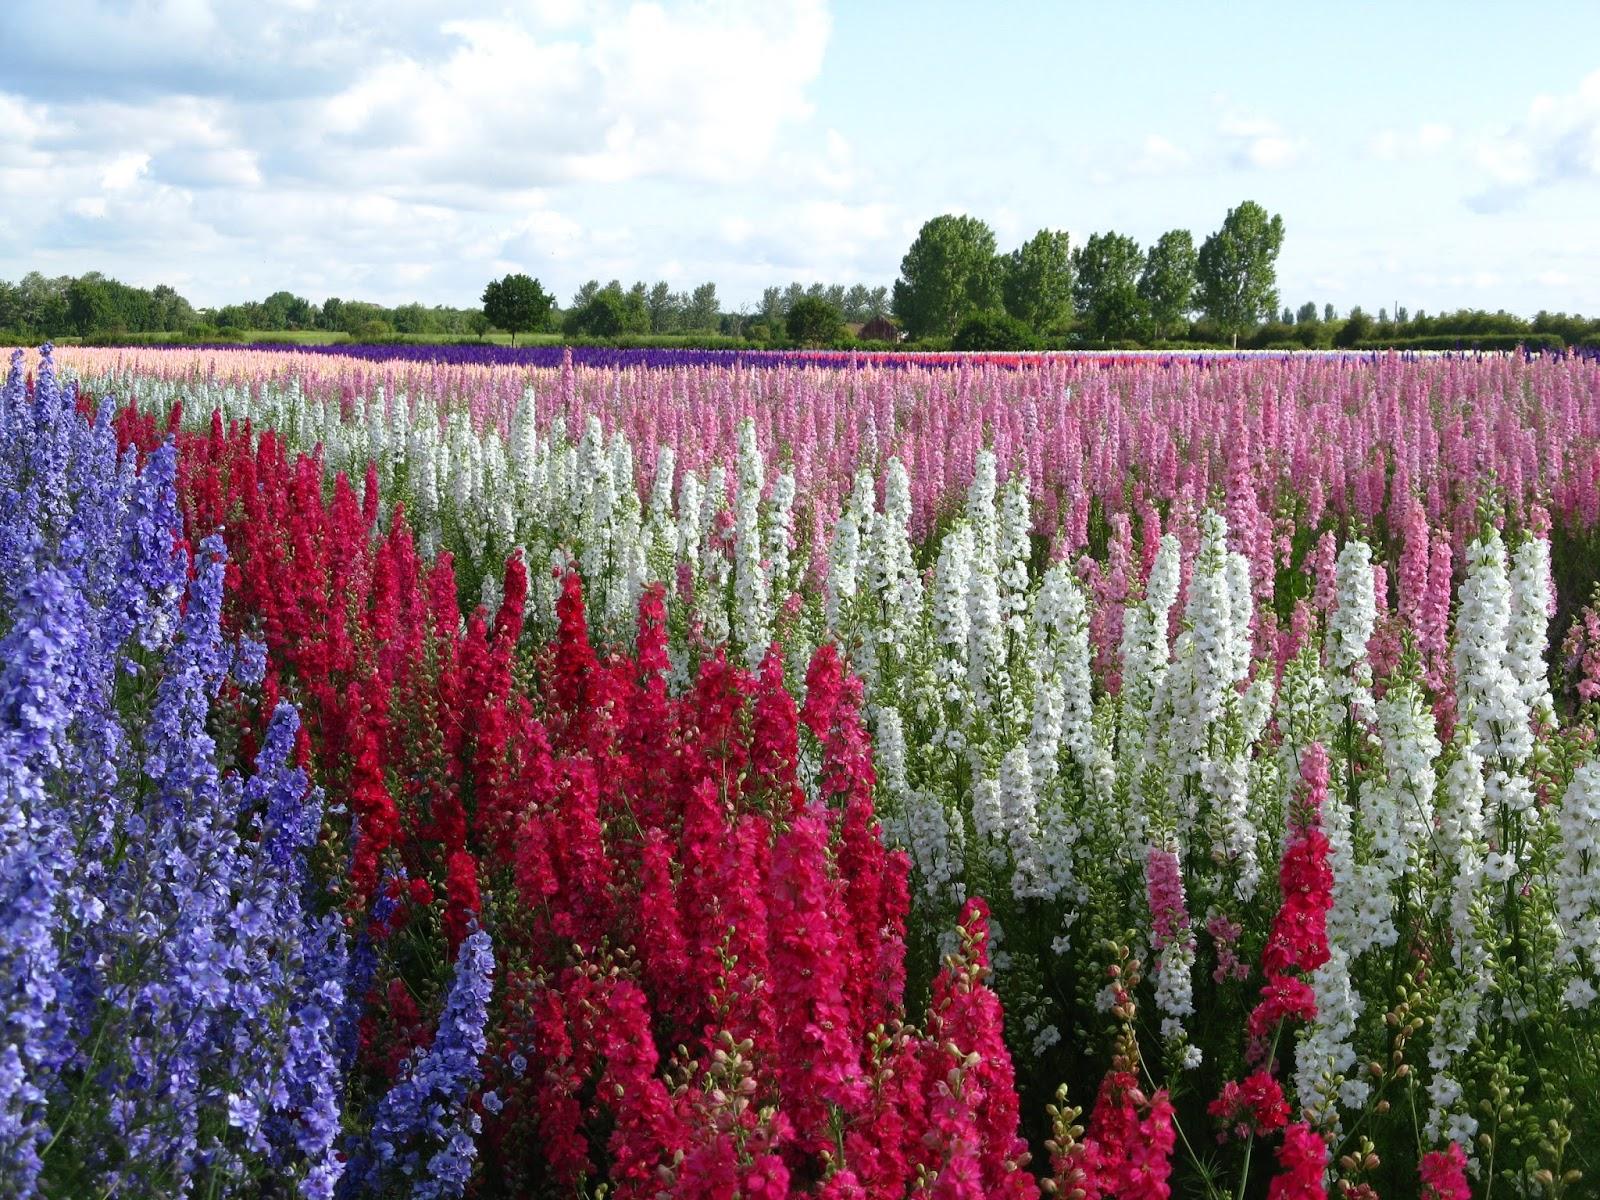 Field Of Flowers Wedding Michigan : The confetti visiting flower field